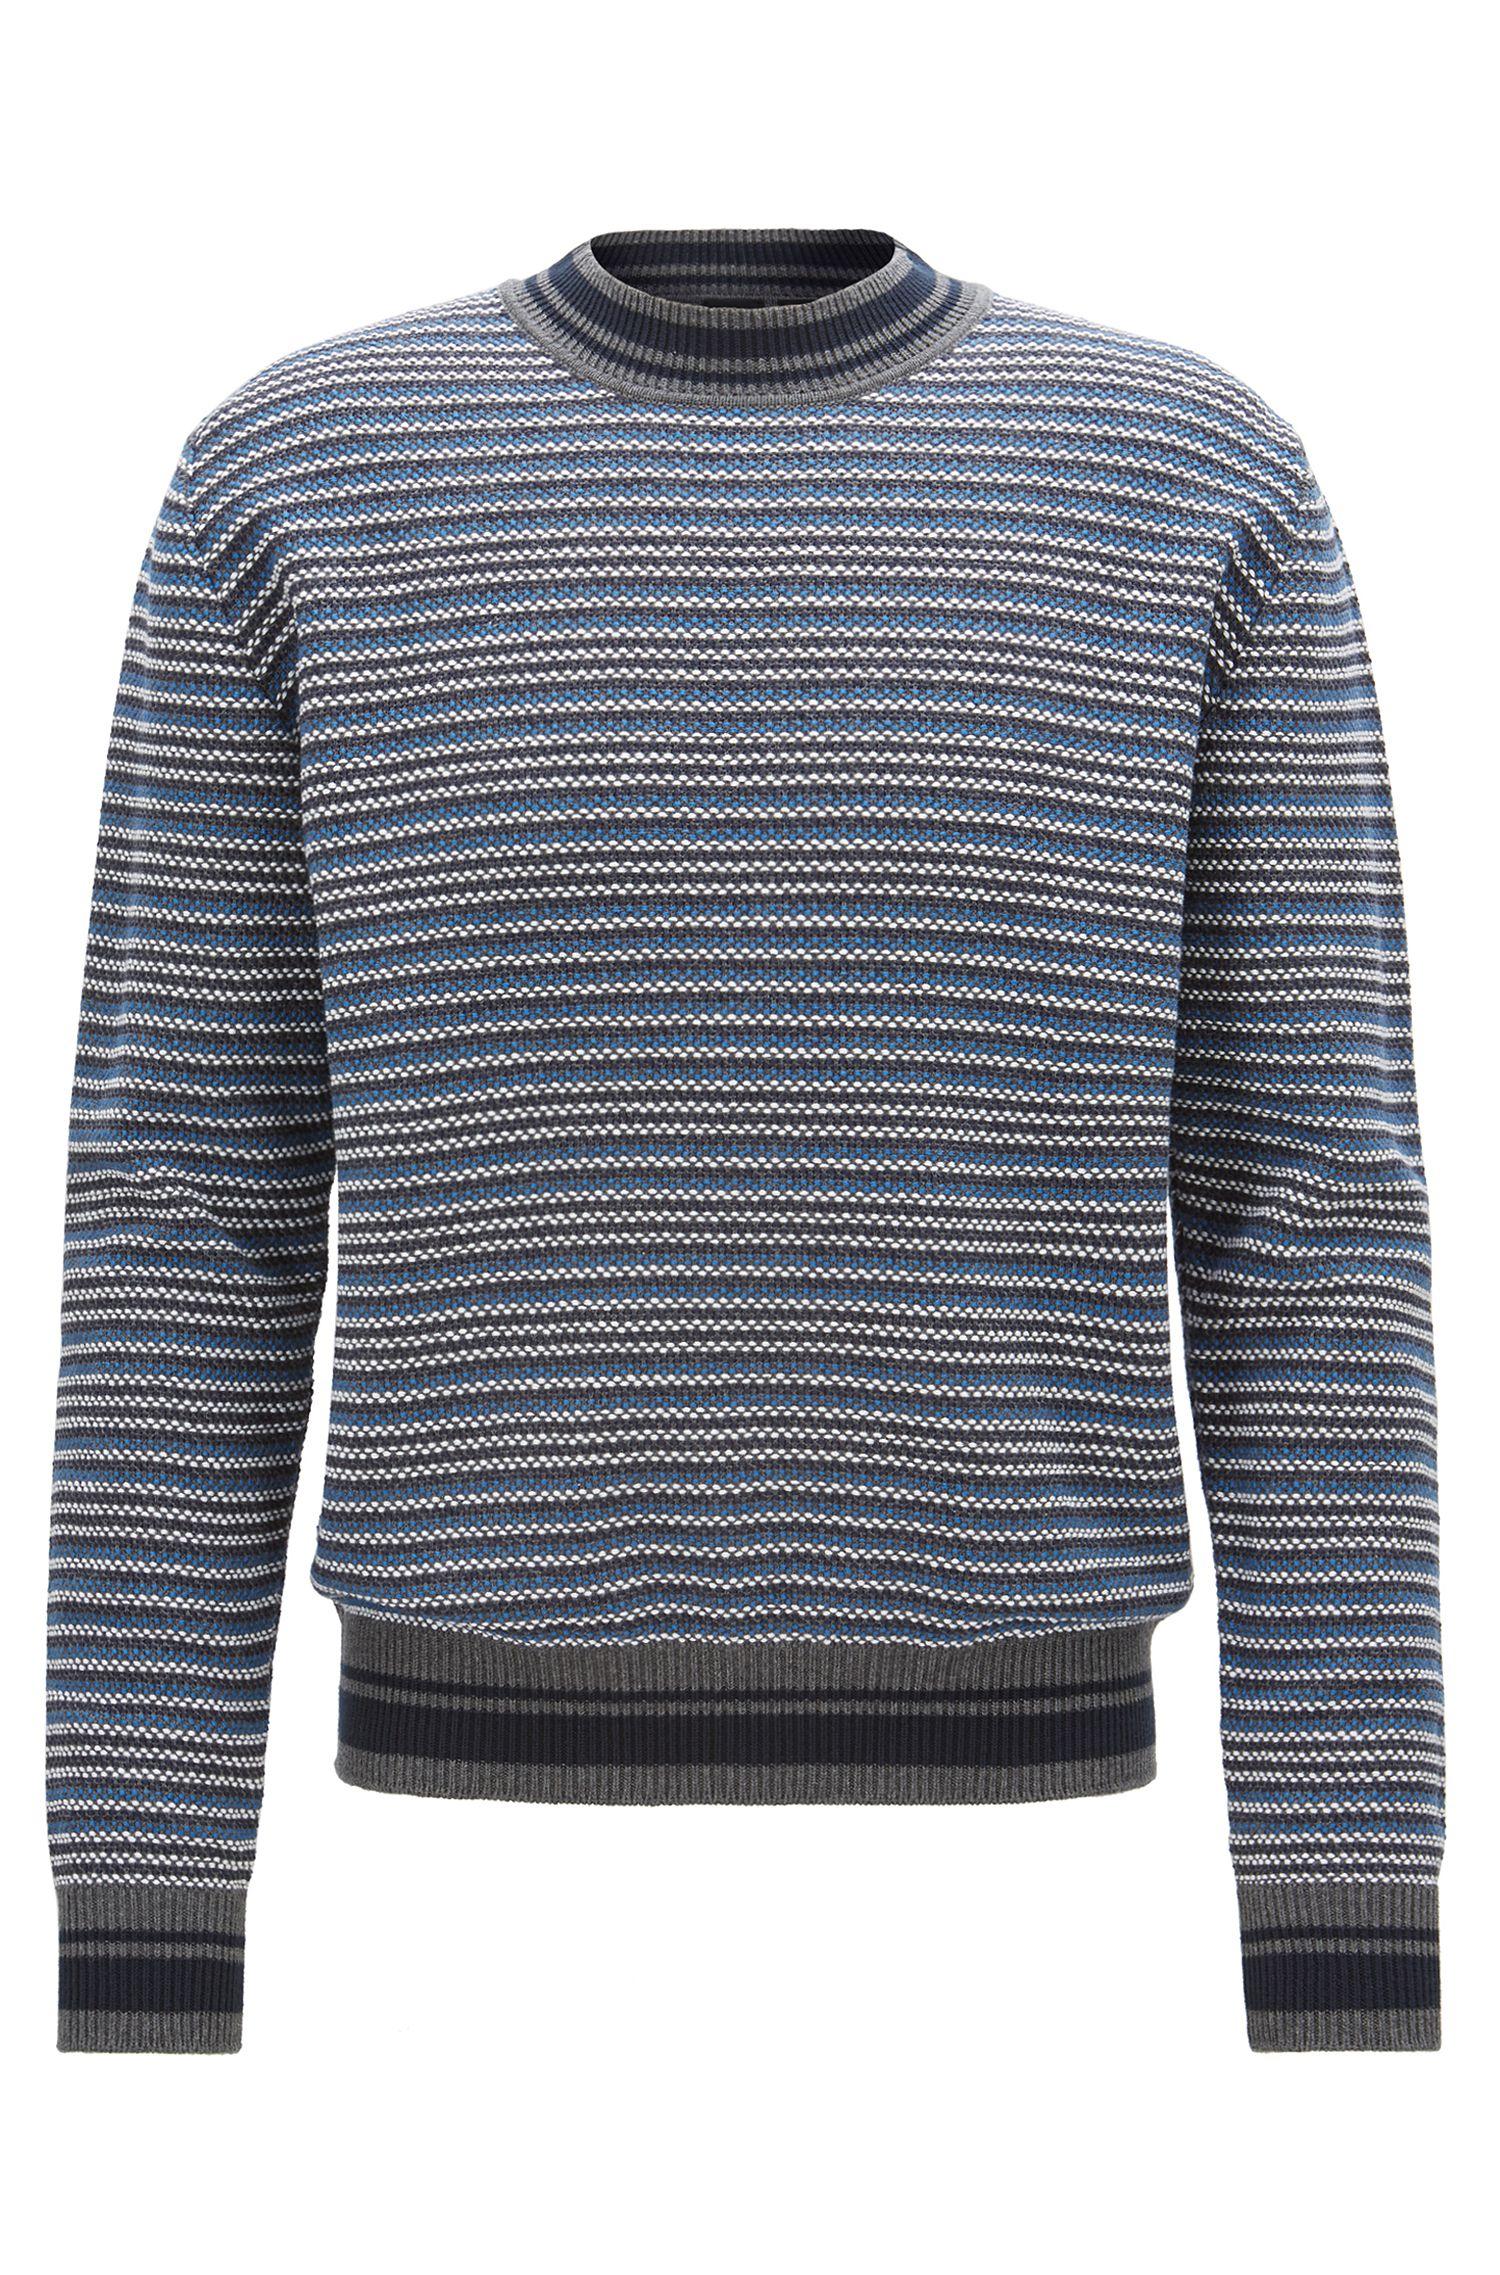 Gestreifter Pullover aus strukturiertem Baumwoll-Jacquard